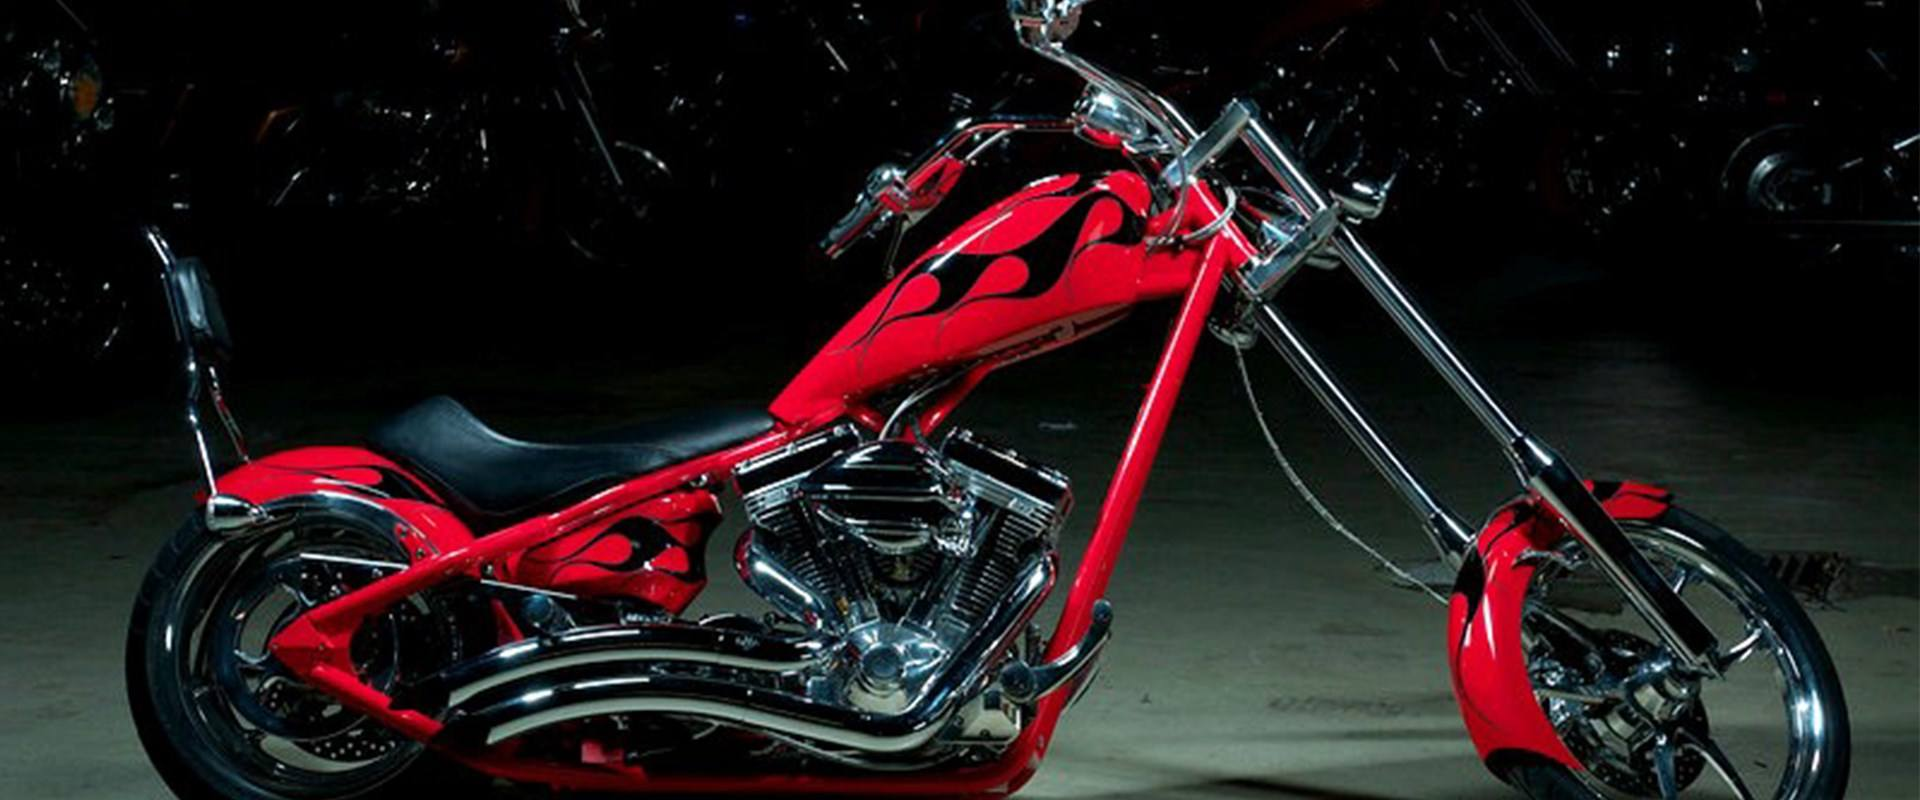 Honda Motorcycle Parts Minnesota